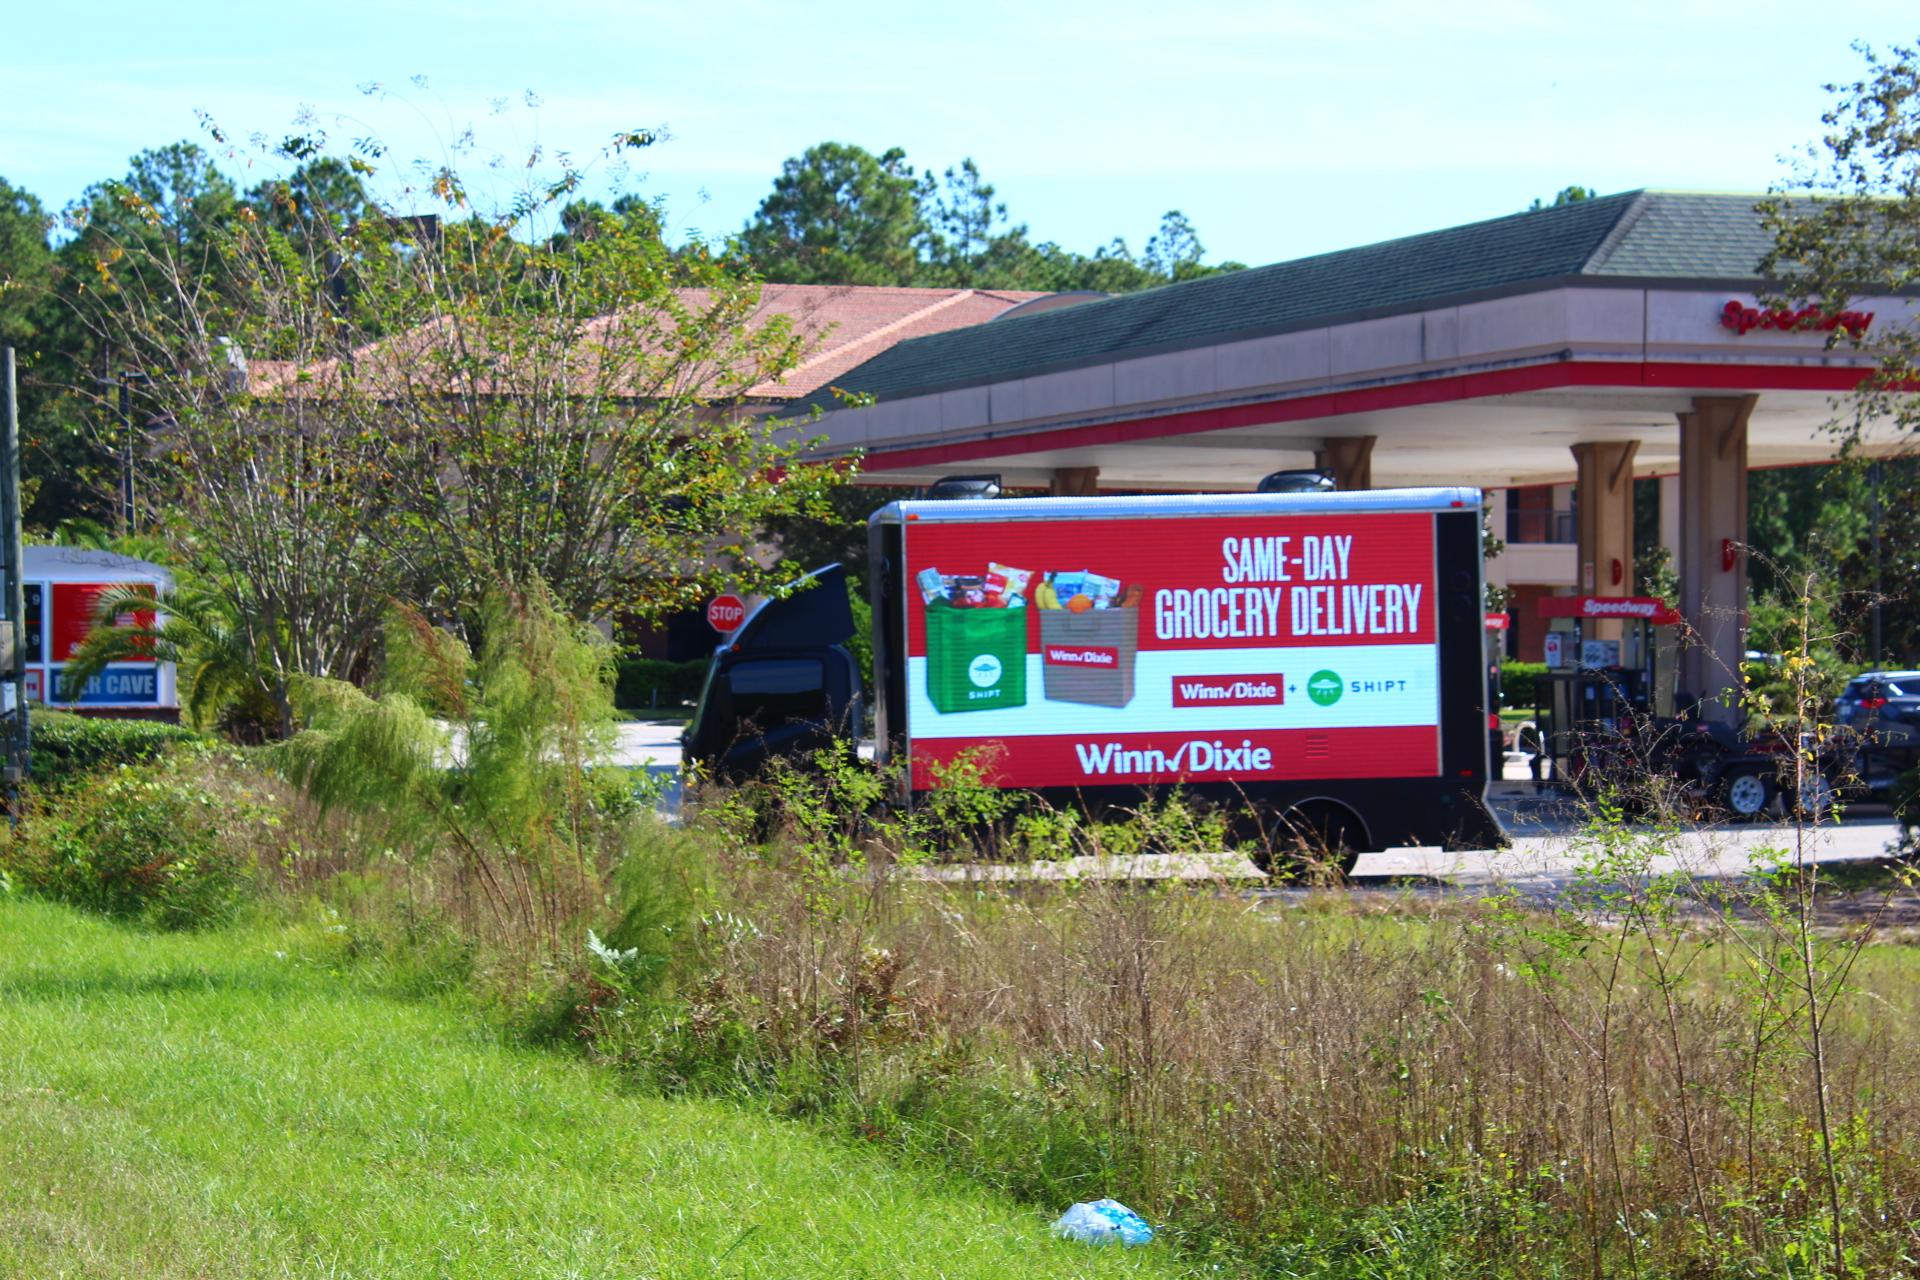 Mobile billboard truck Jacksonville; Digital billboard truck - Here is our Mobile LED truck in Jacksonville advertising a Winn-Dixie supermarket store.